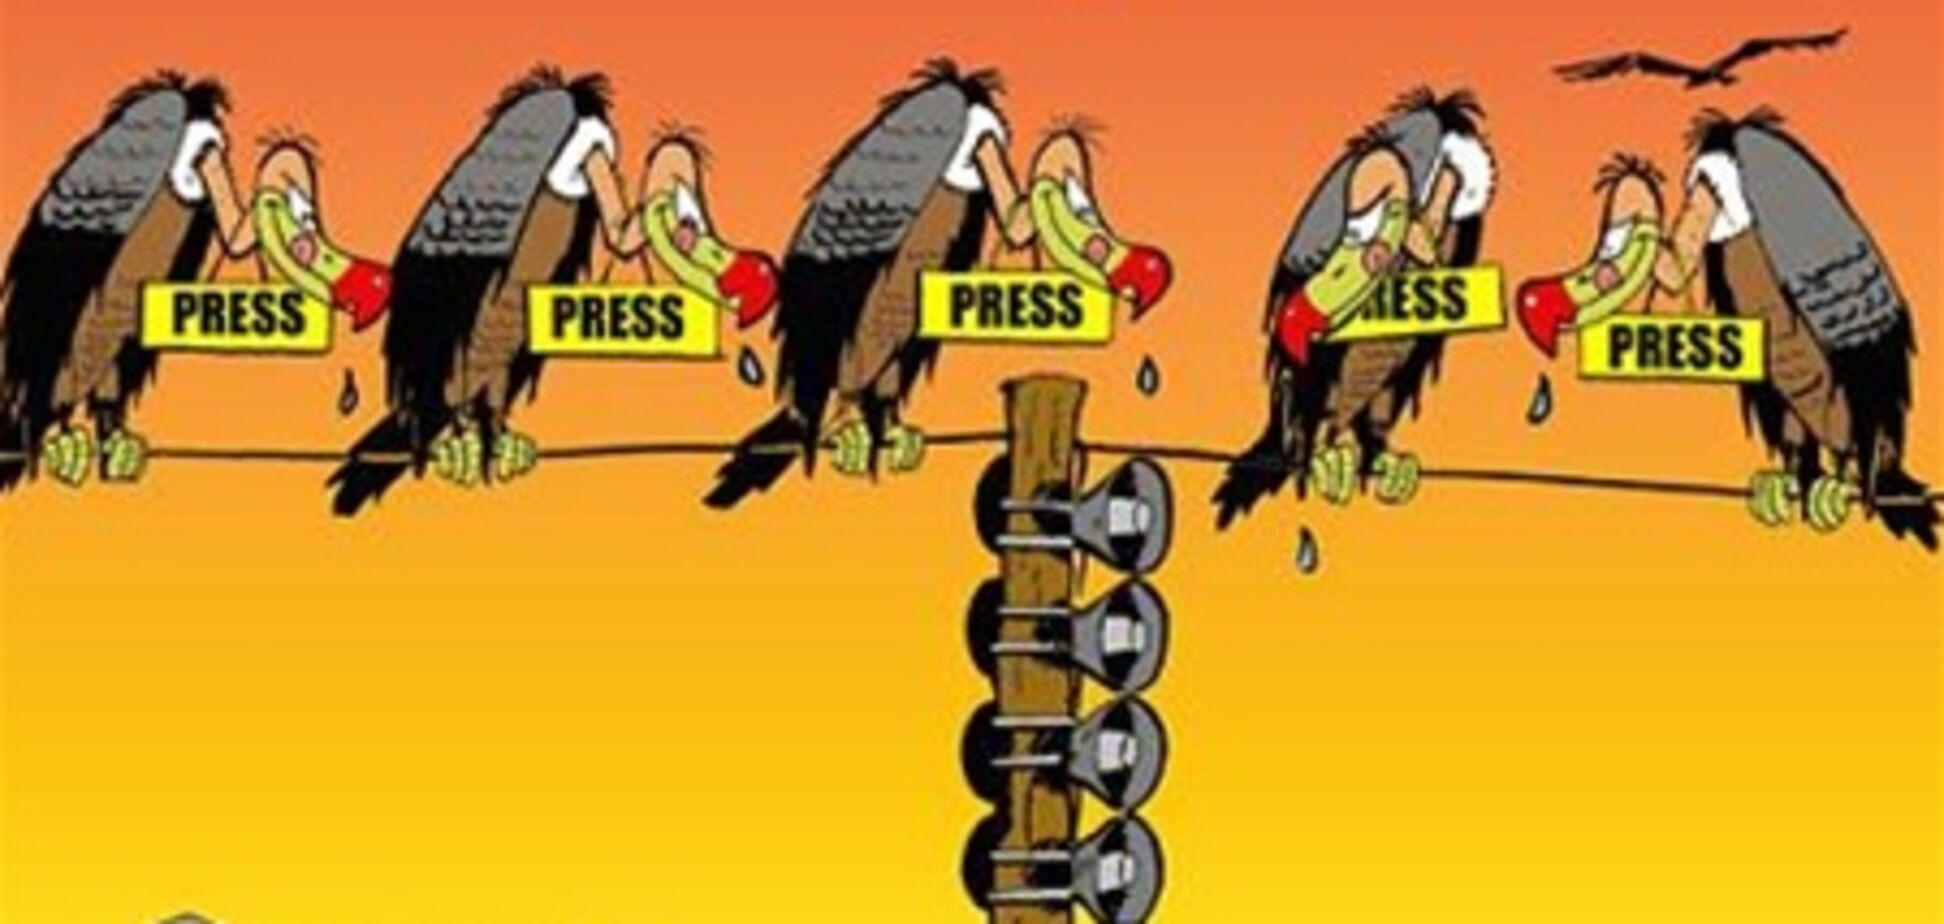 Журналісти та журналісти